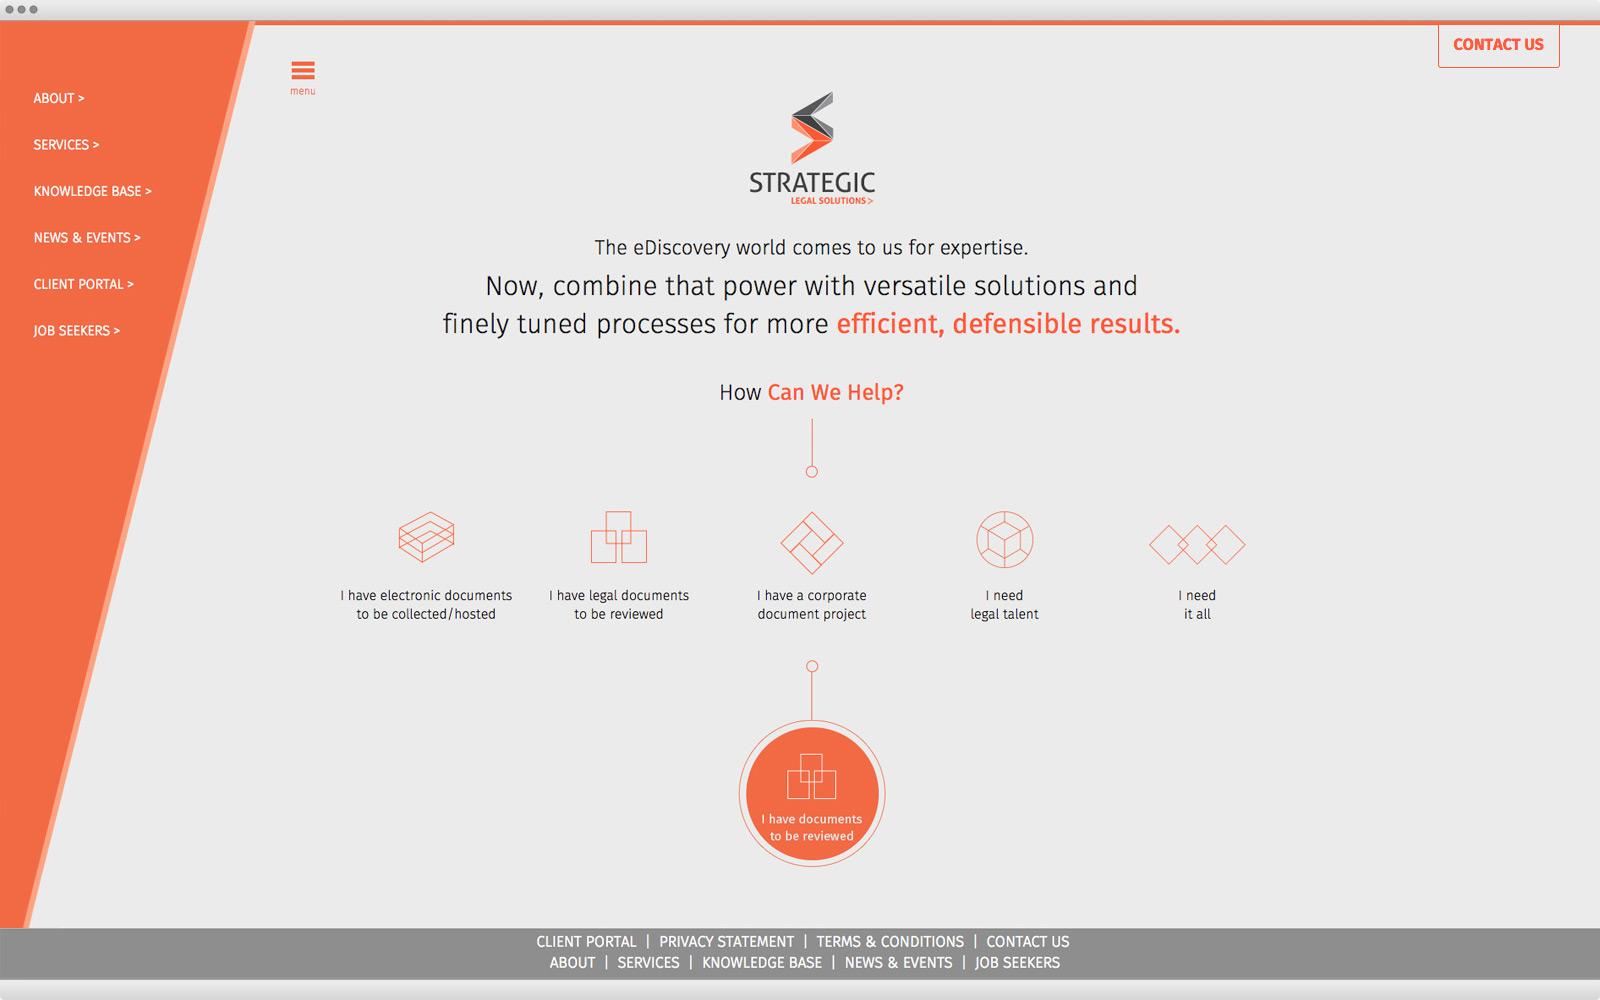 Strategic Legal Services